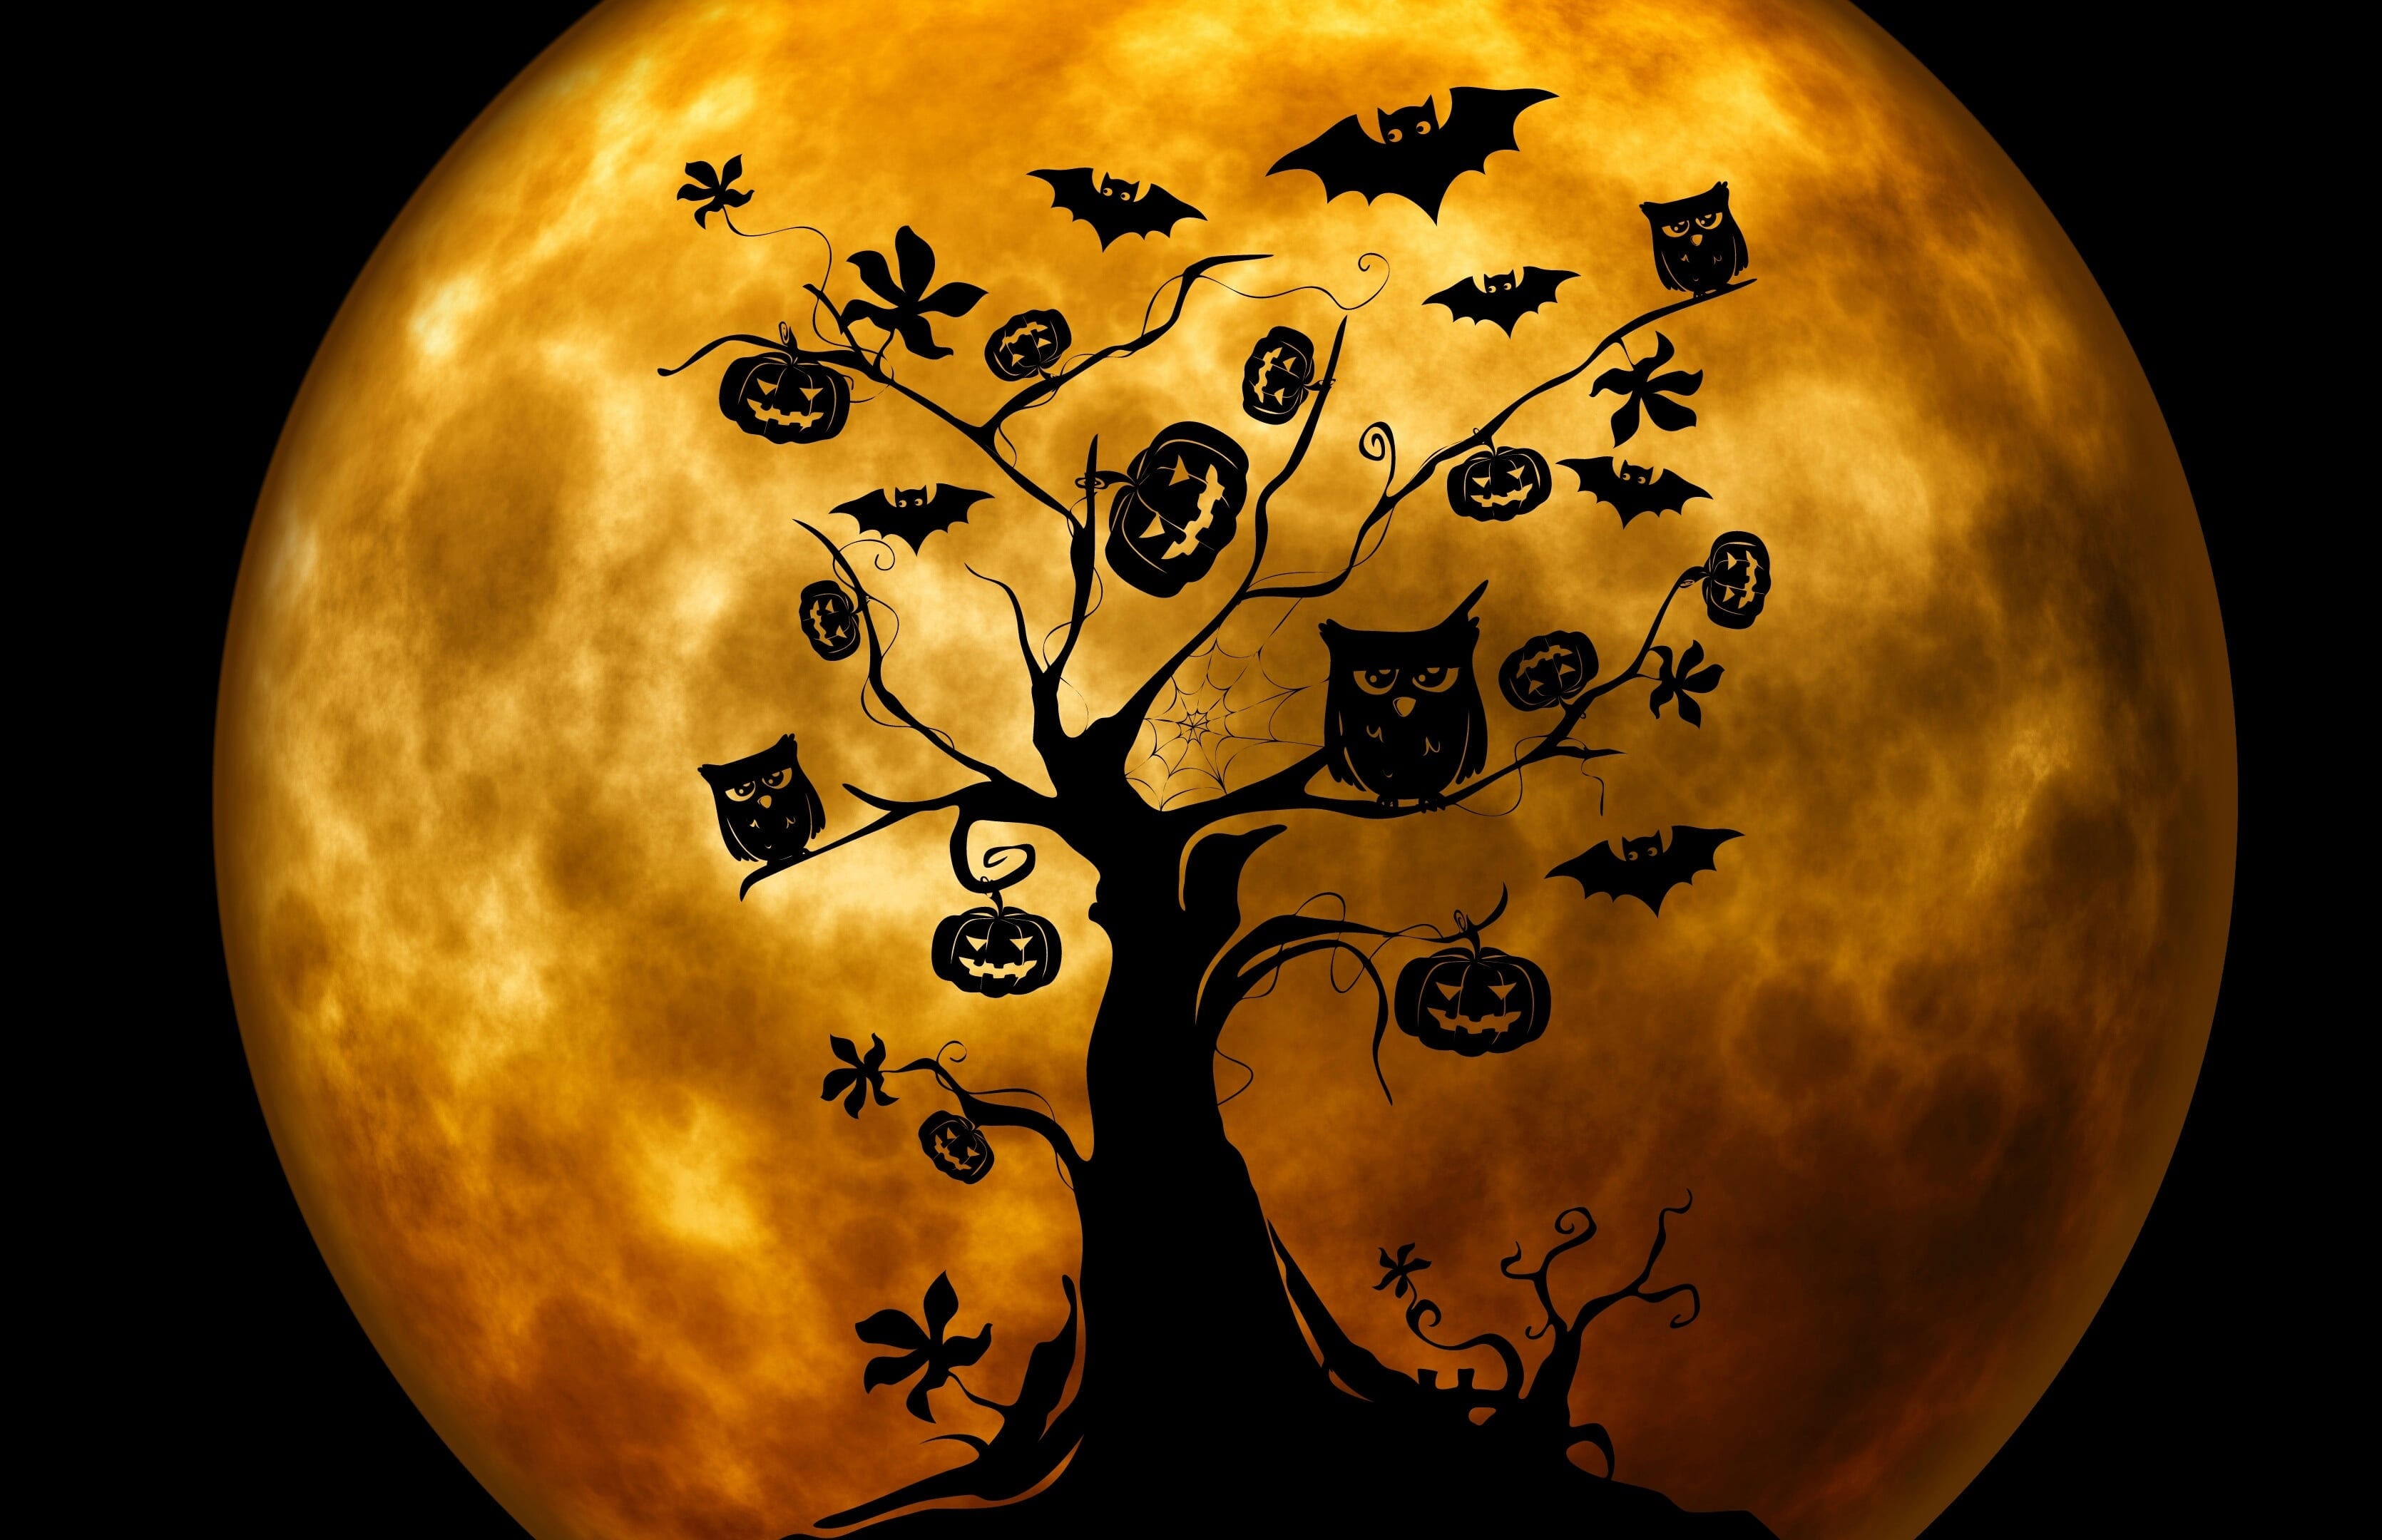 Fondos Para Pantalla: Descarga Los Mejores Fondos De Pantalla Para Halloween